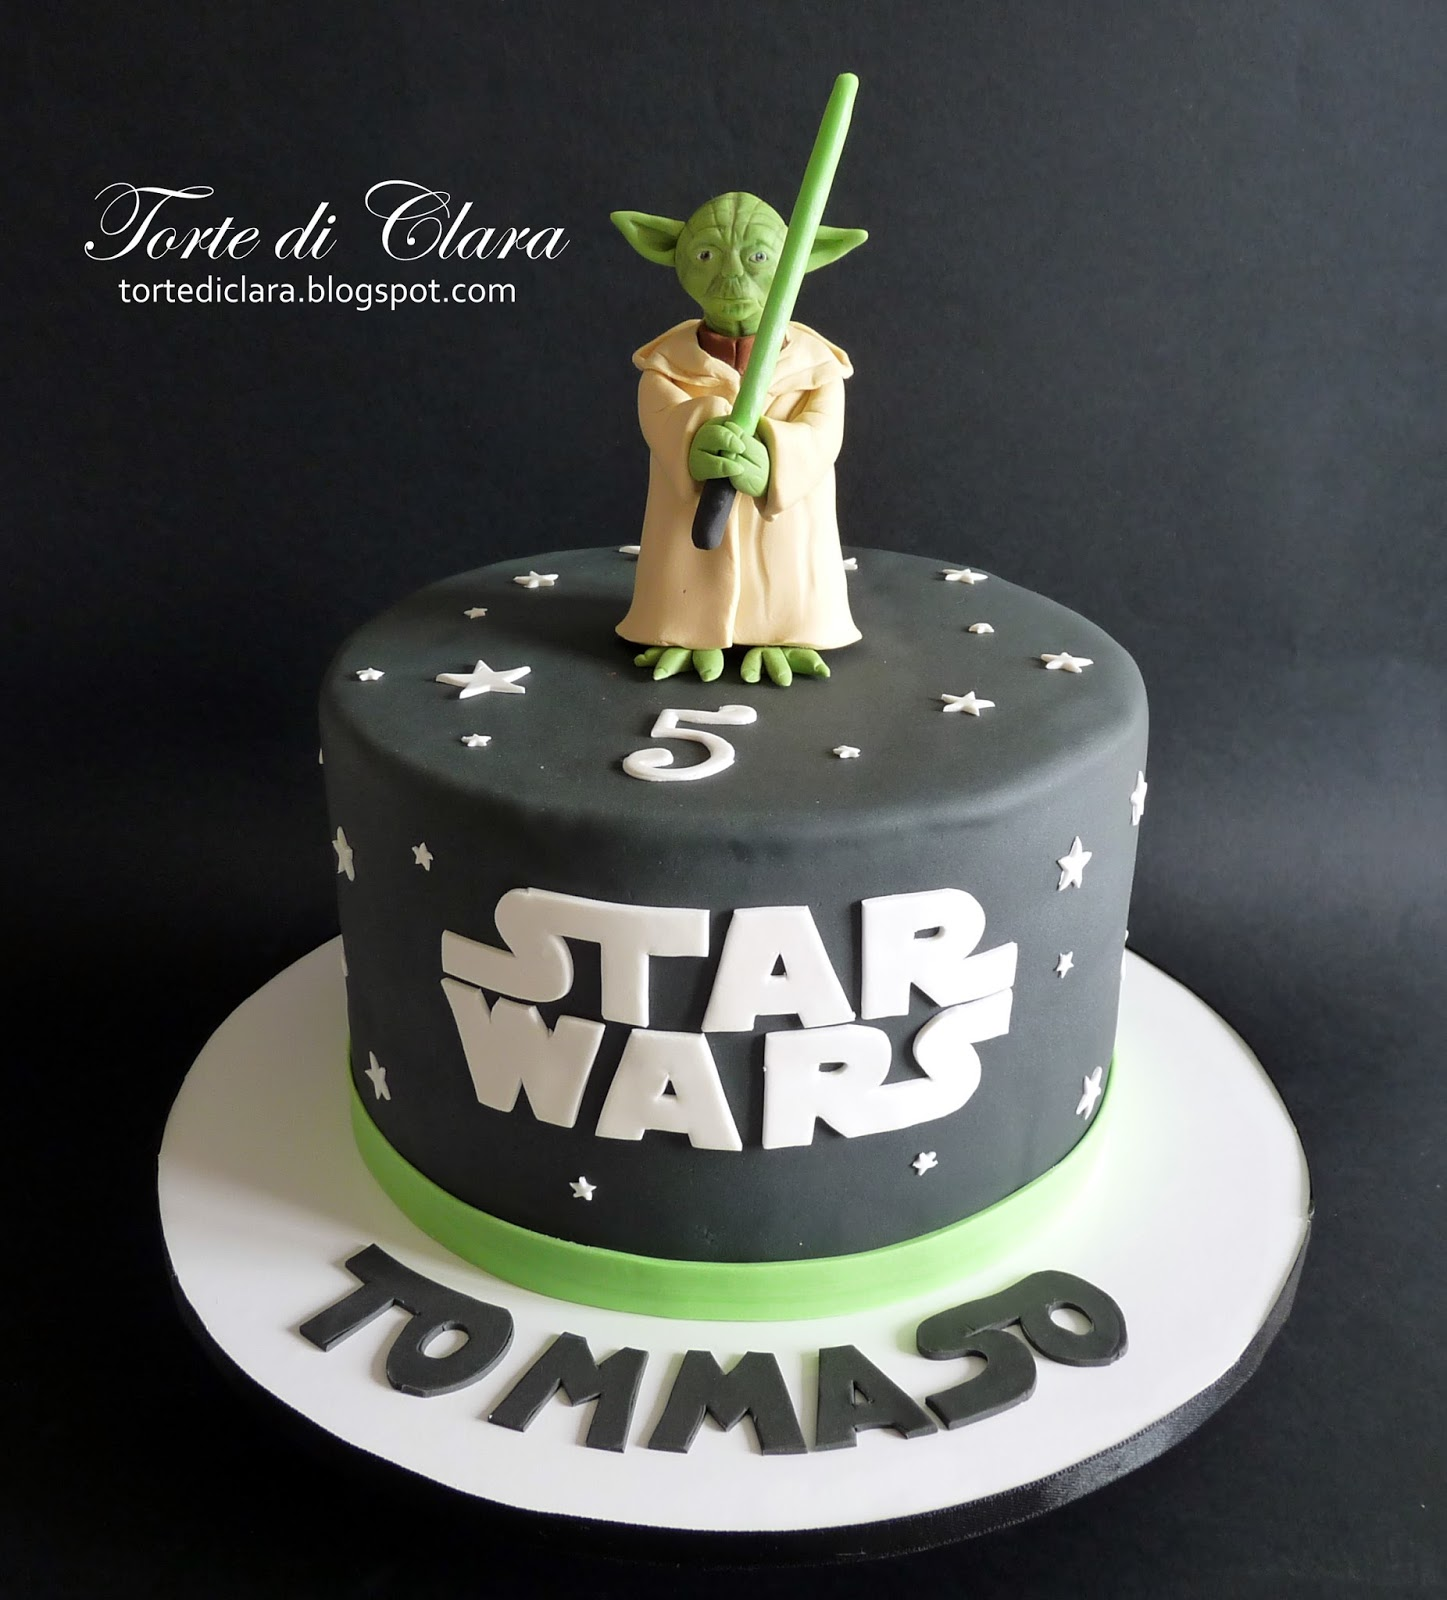 Ben noto Torte di Clara: Star Wars cake (2) ML88